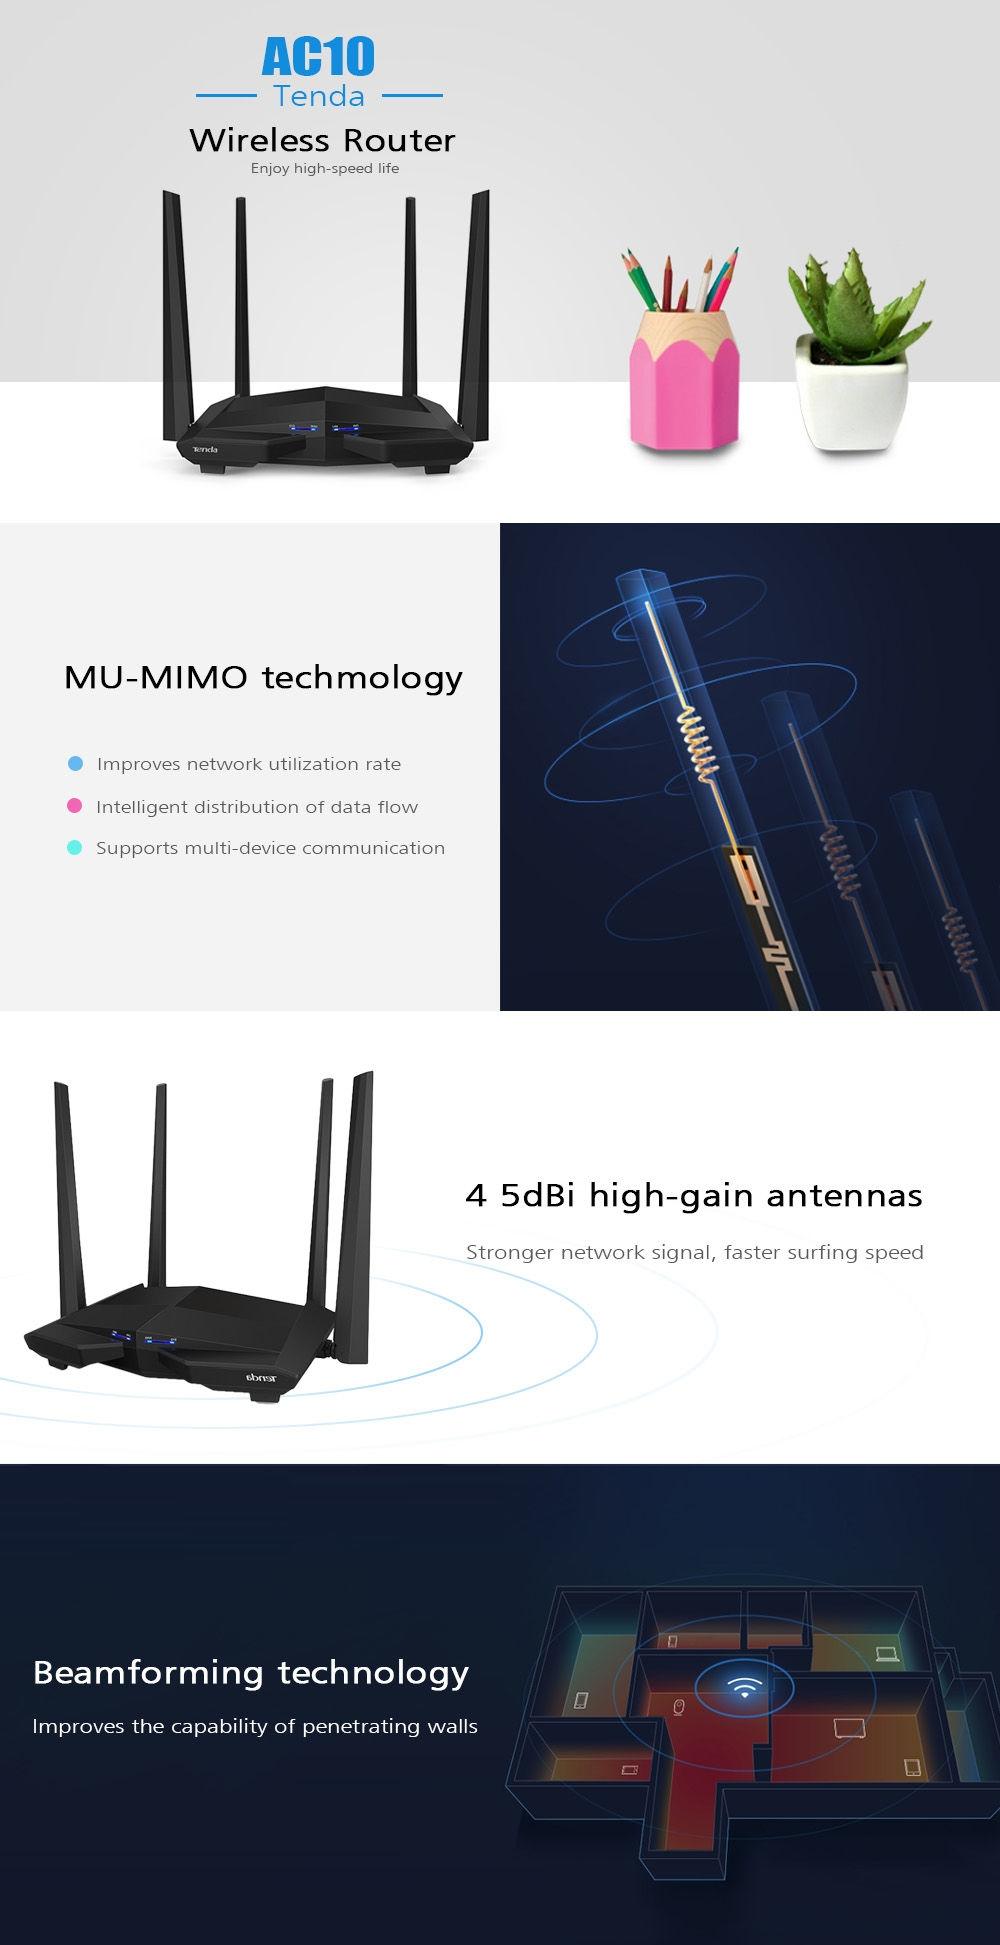 Tenda AC10 Wireless Router 1167Mbps / 2.4GHz + 5GHz Dual Band Wi-Fi / 4 5dBi Antennas